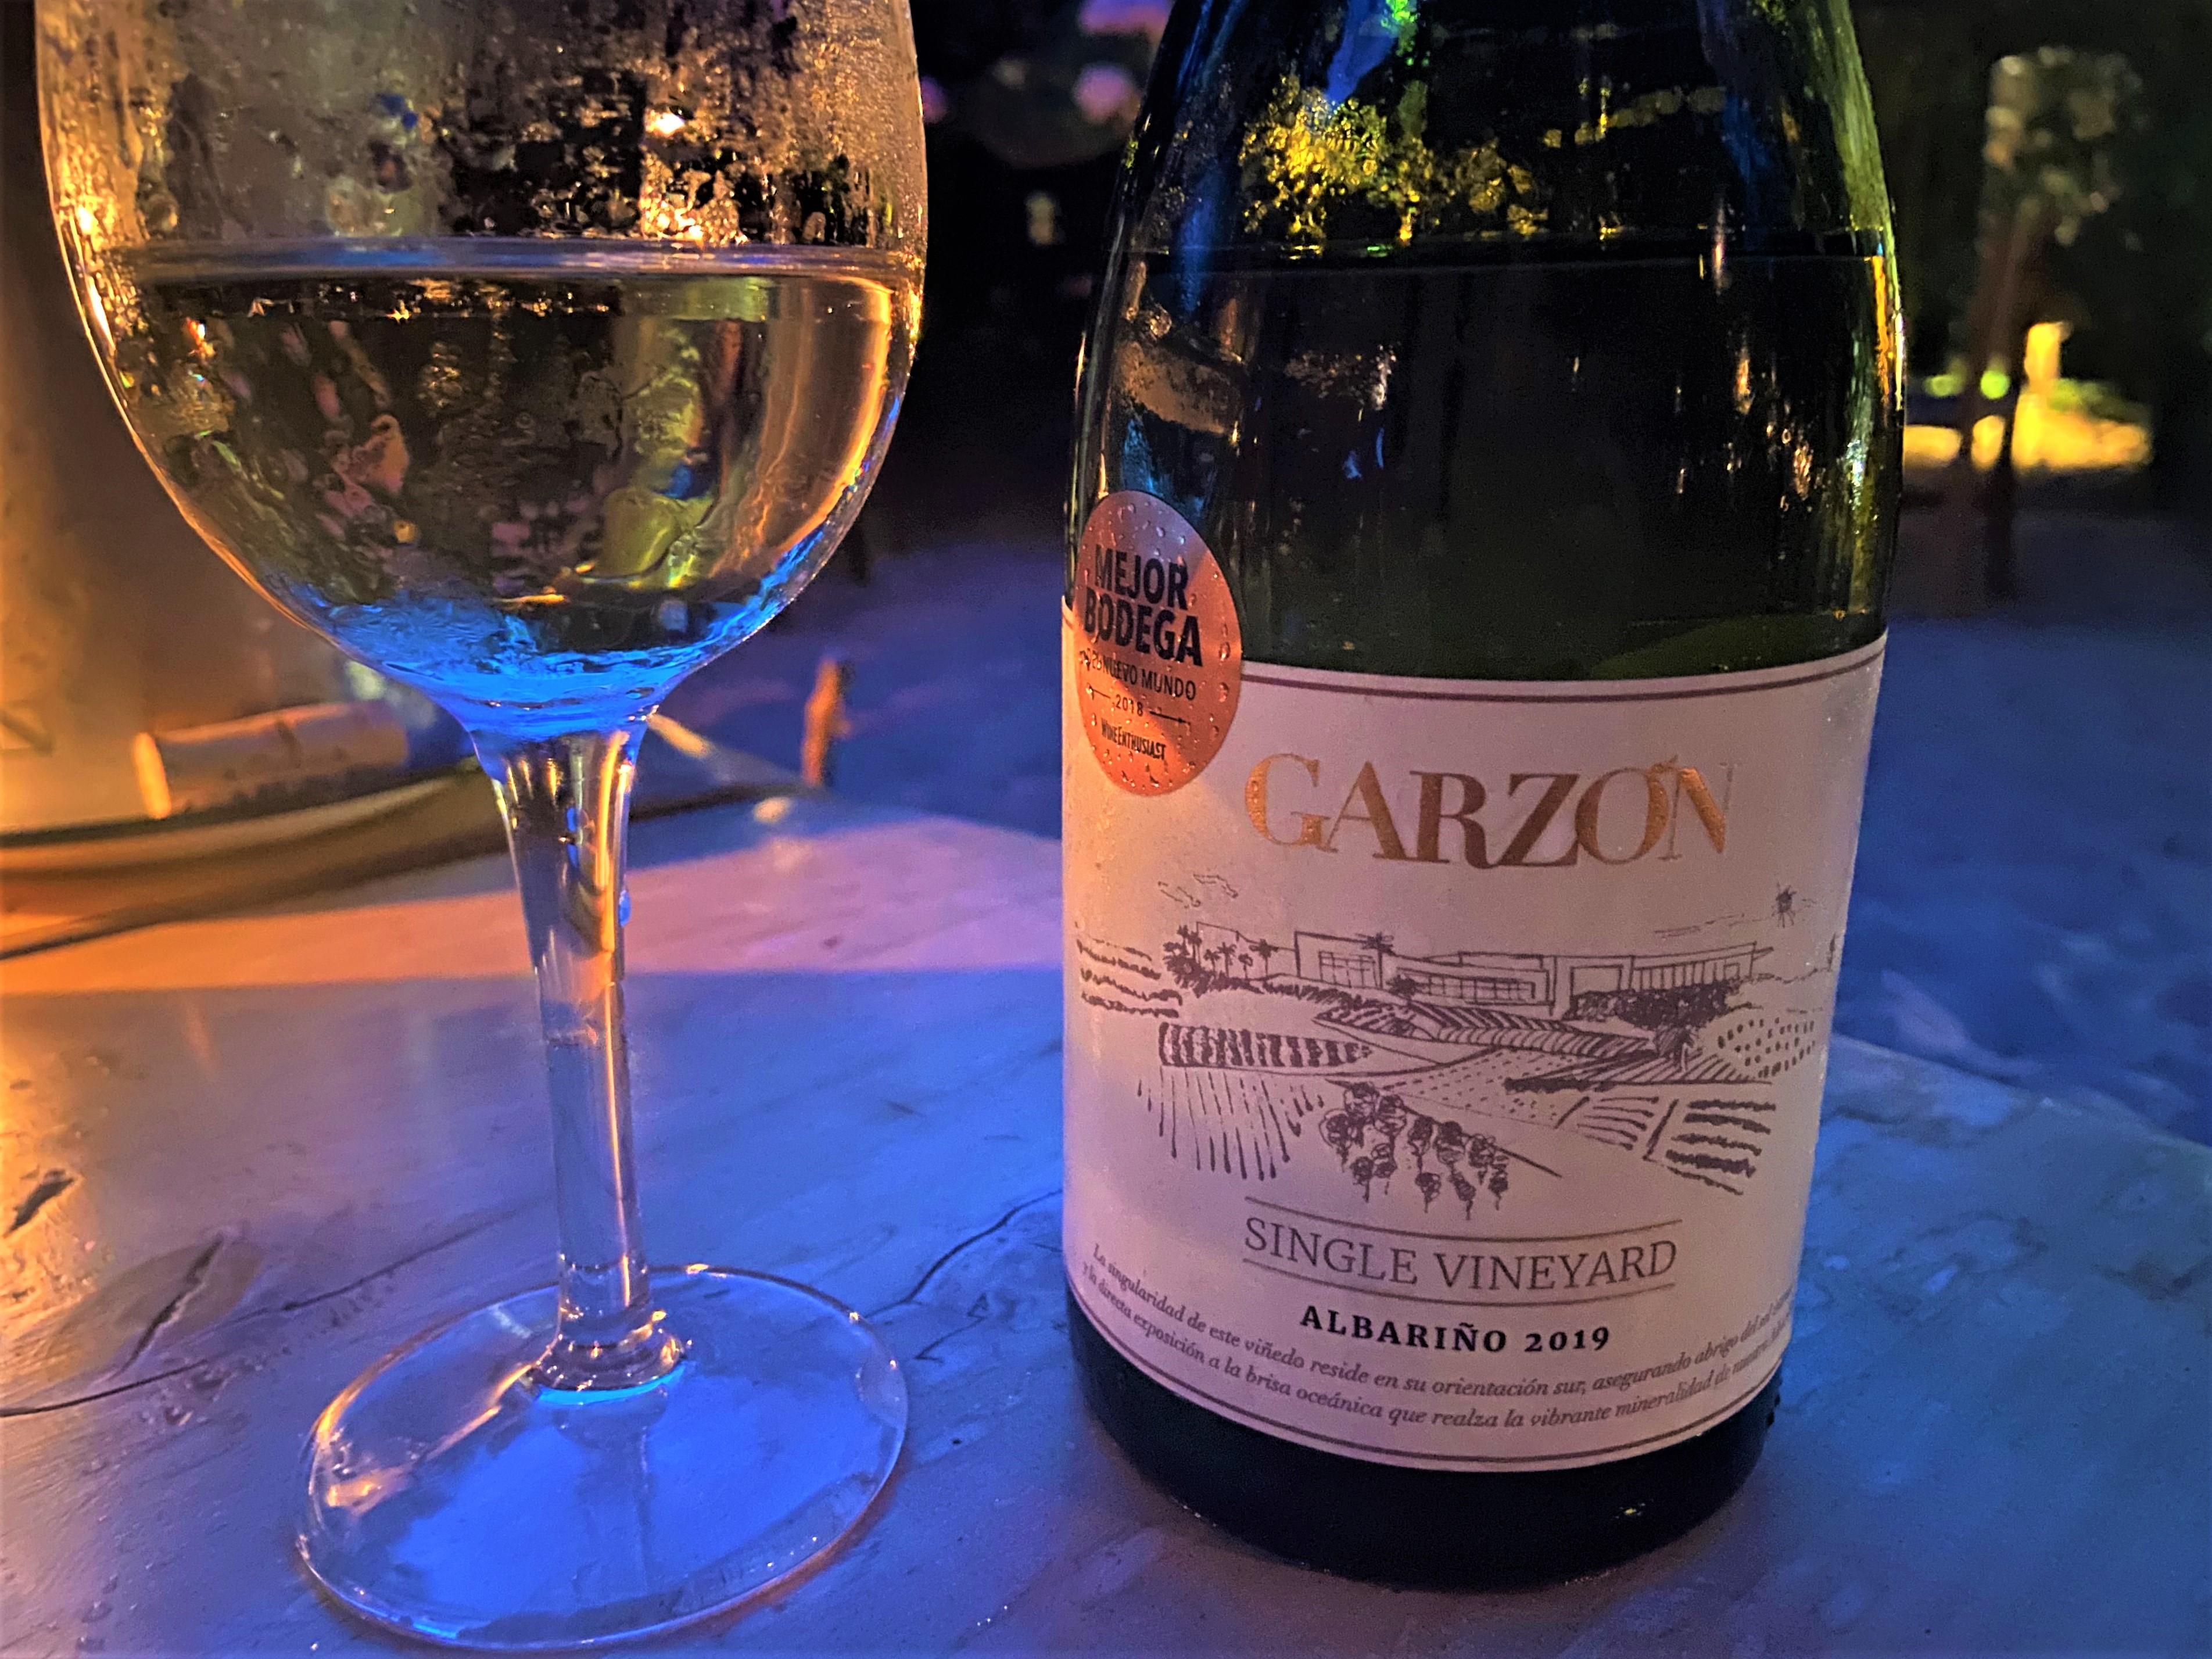 Garzón Single Vineyard Albarino